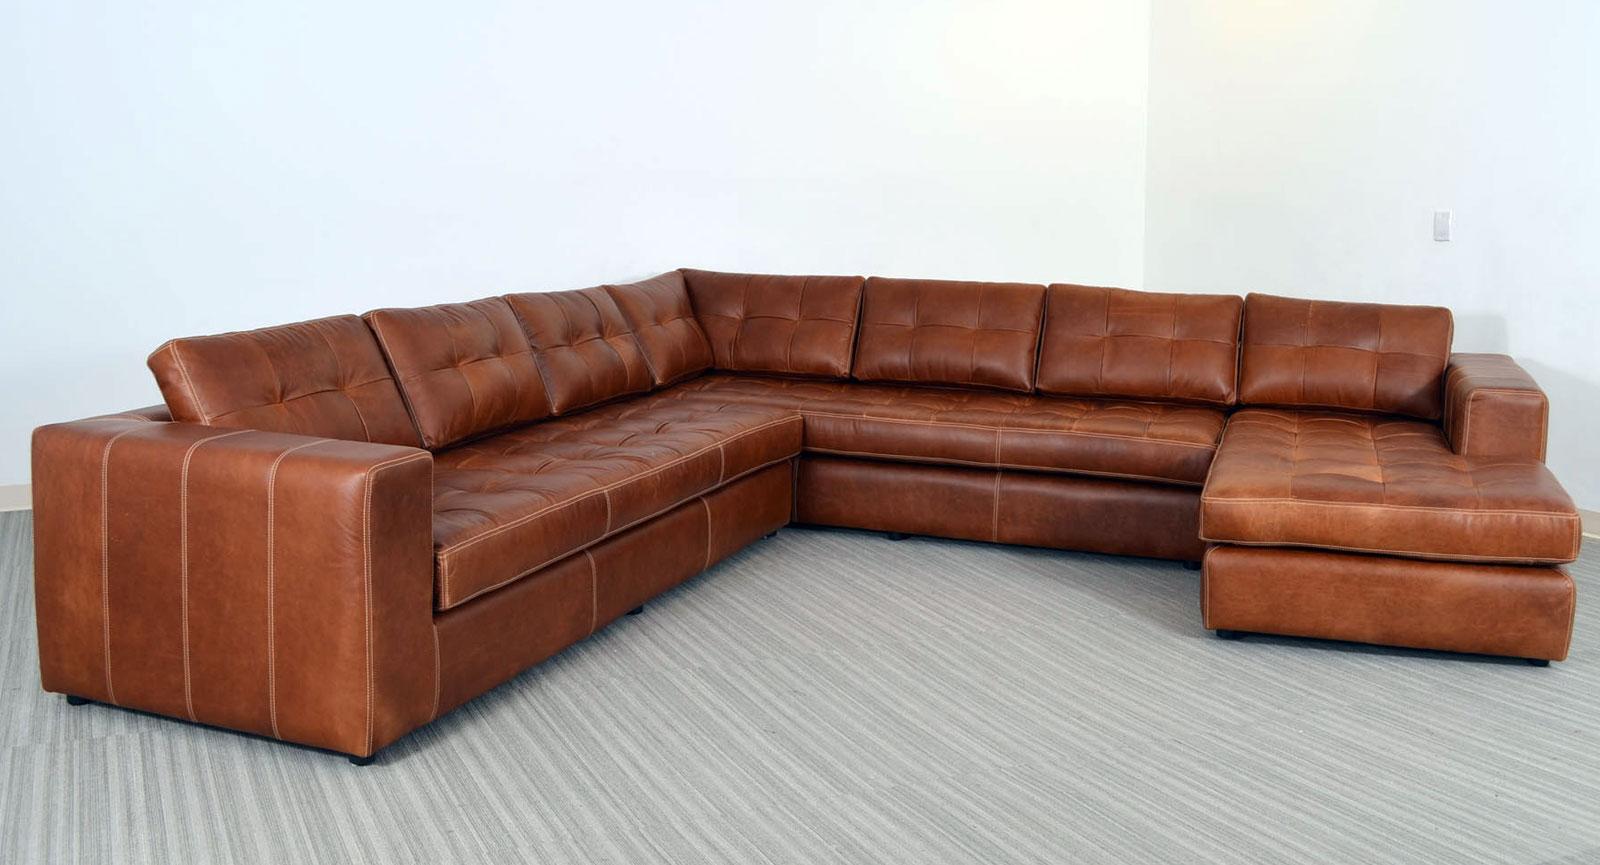 Armless corner sofa armless corner sofa 34 with saitama for Sofa bed no arms